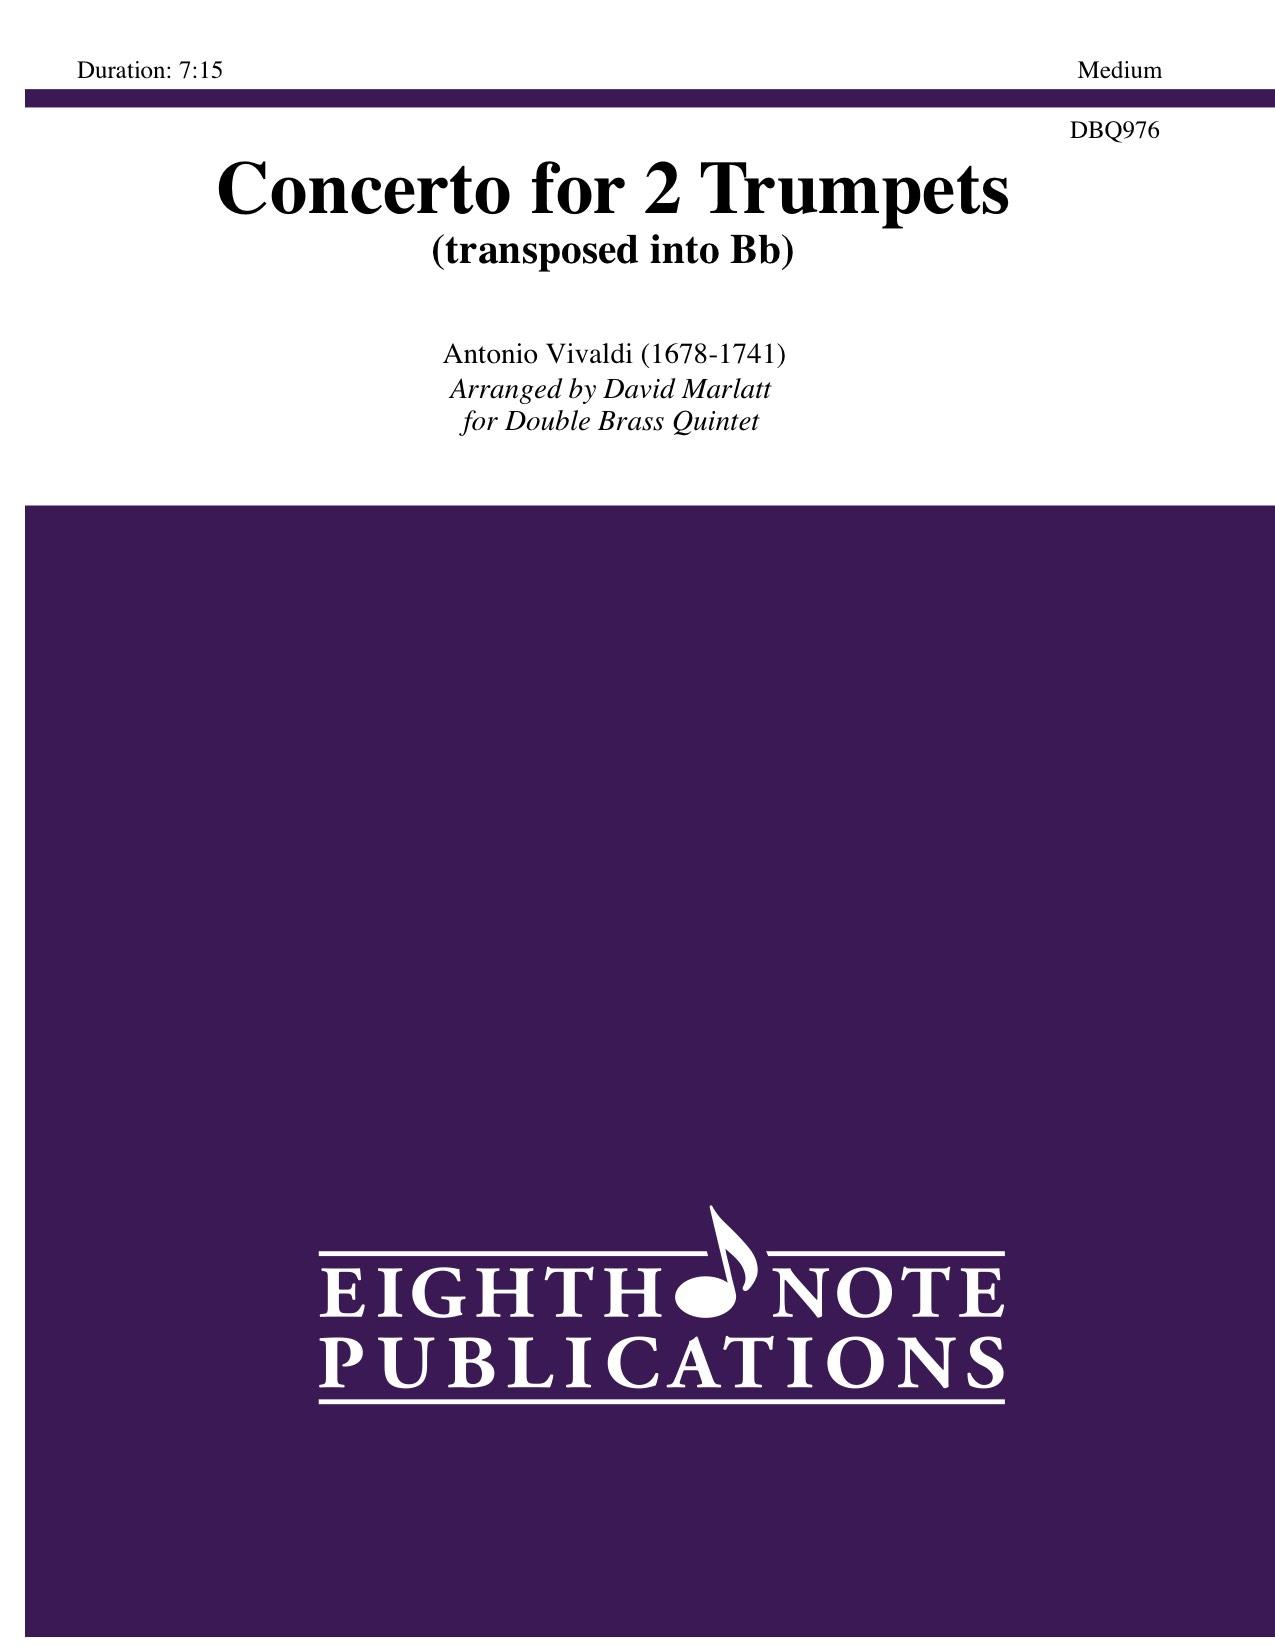 Concerto for 2 Trumpets (transposed into Bb) - Antonio Vivaldi